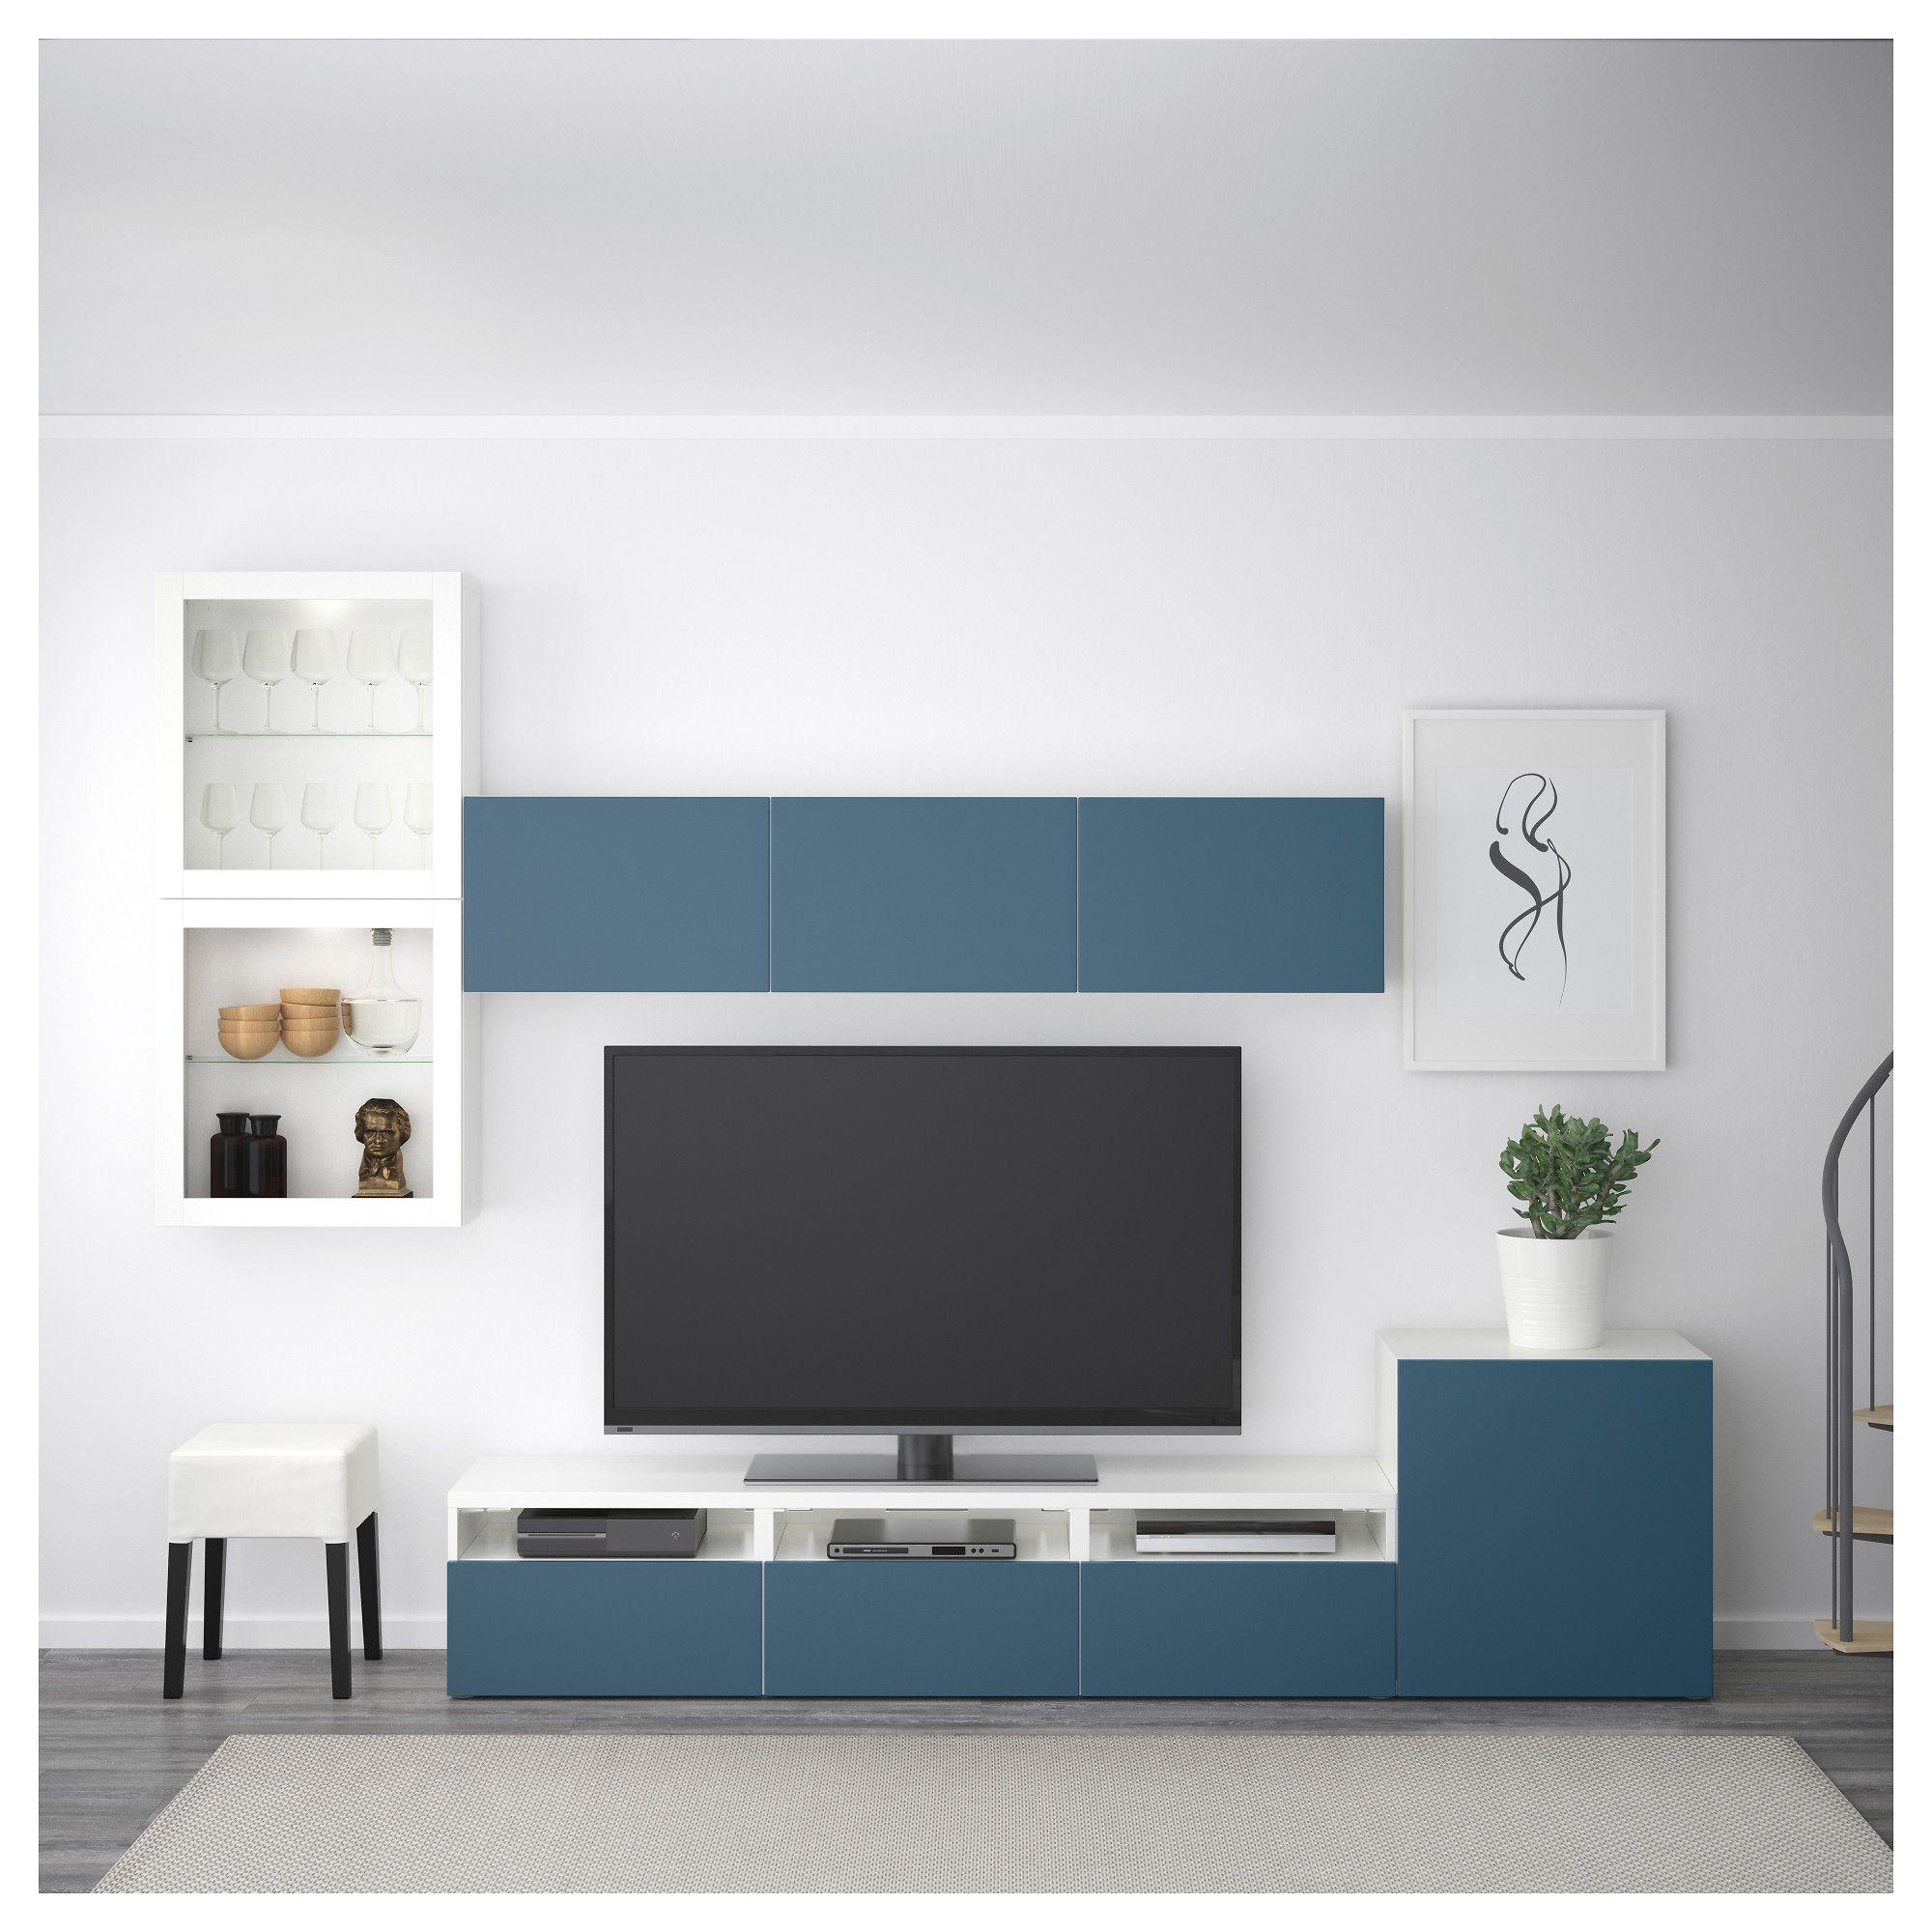 Furniture and Home Furnishings Tv unit decor, Modern tv